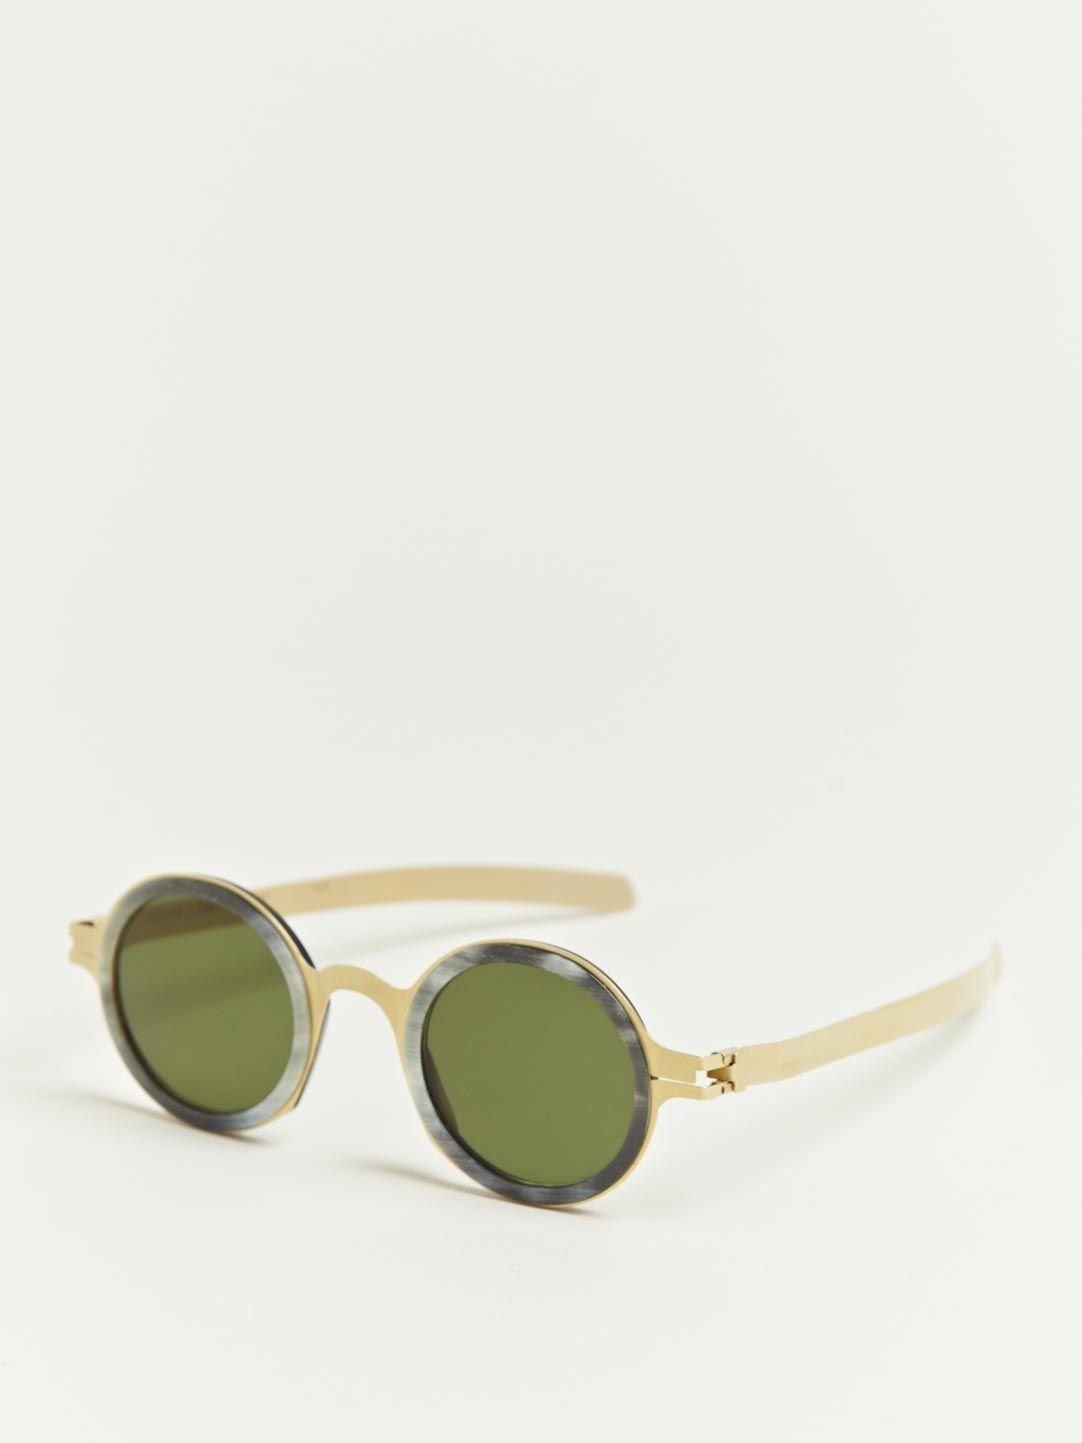 496f424f6d96 Damir Doma x Mykita Men s Gold Frame Sunglasses